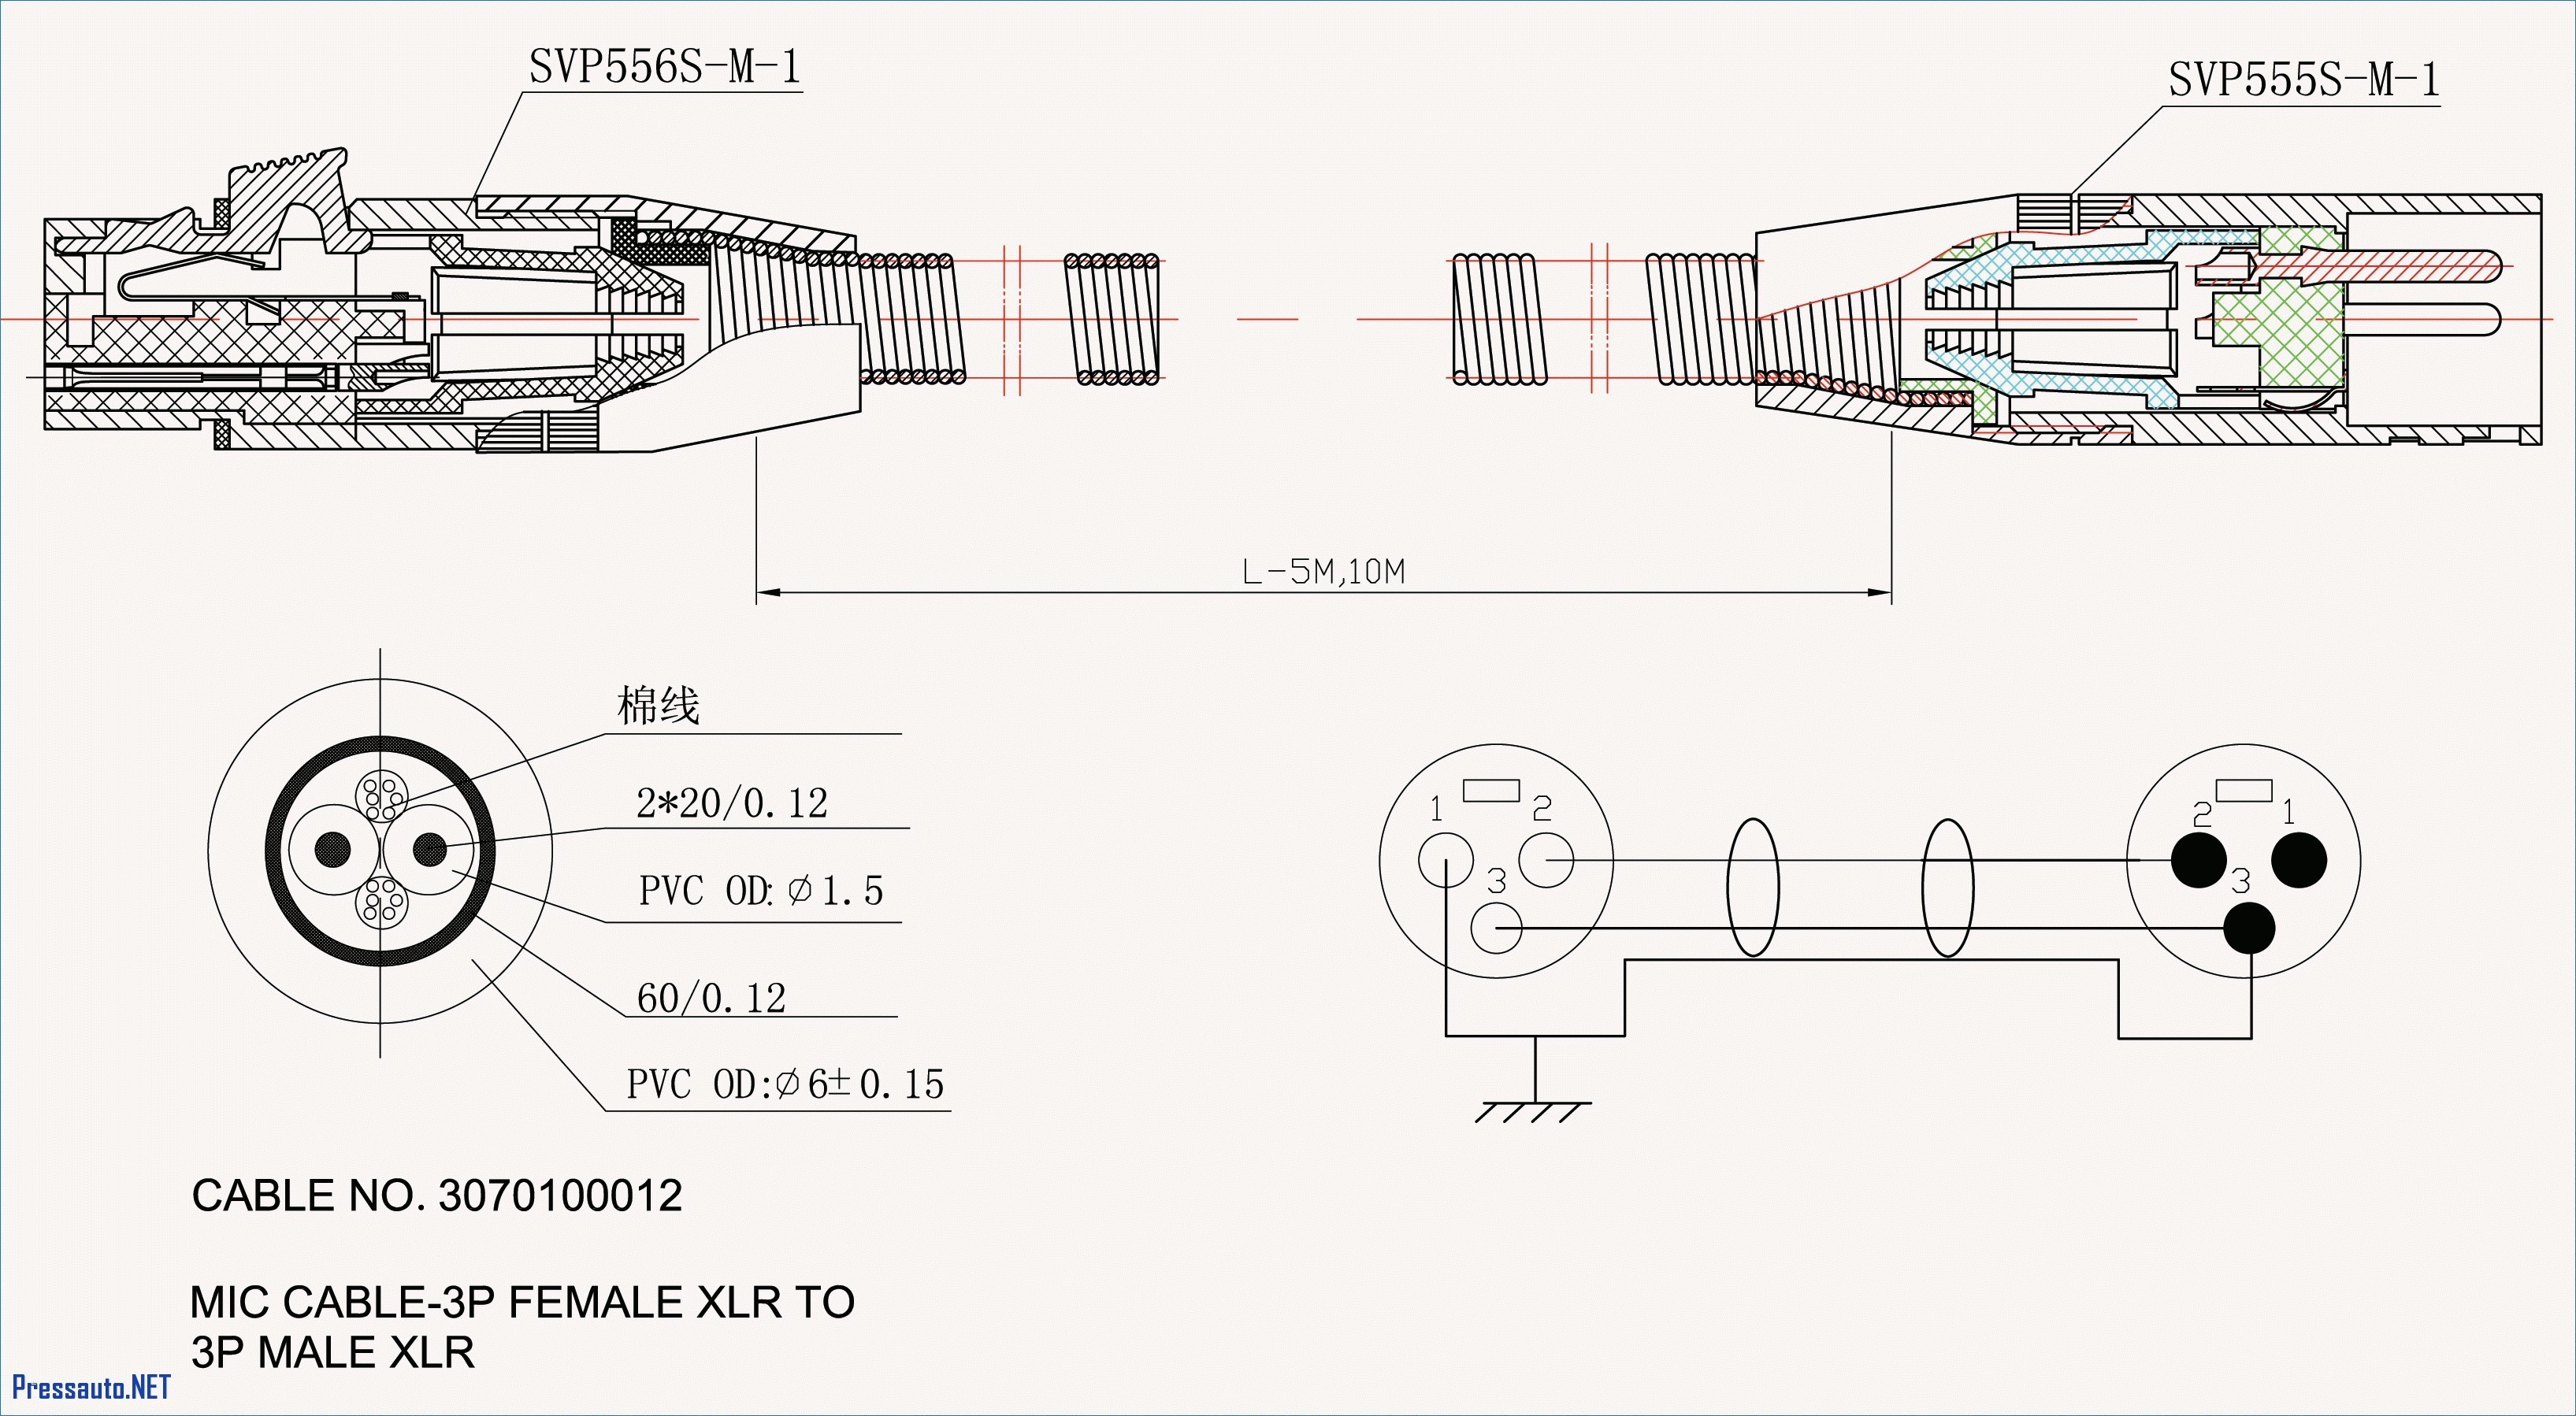 Tremendous Taurus 1911 Schematic Online Wiring Diagram Wiring Database Lotapmagn4X4Andersnl